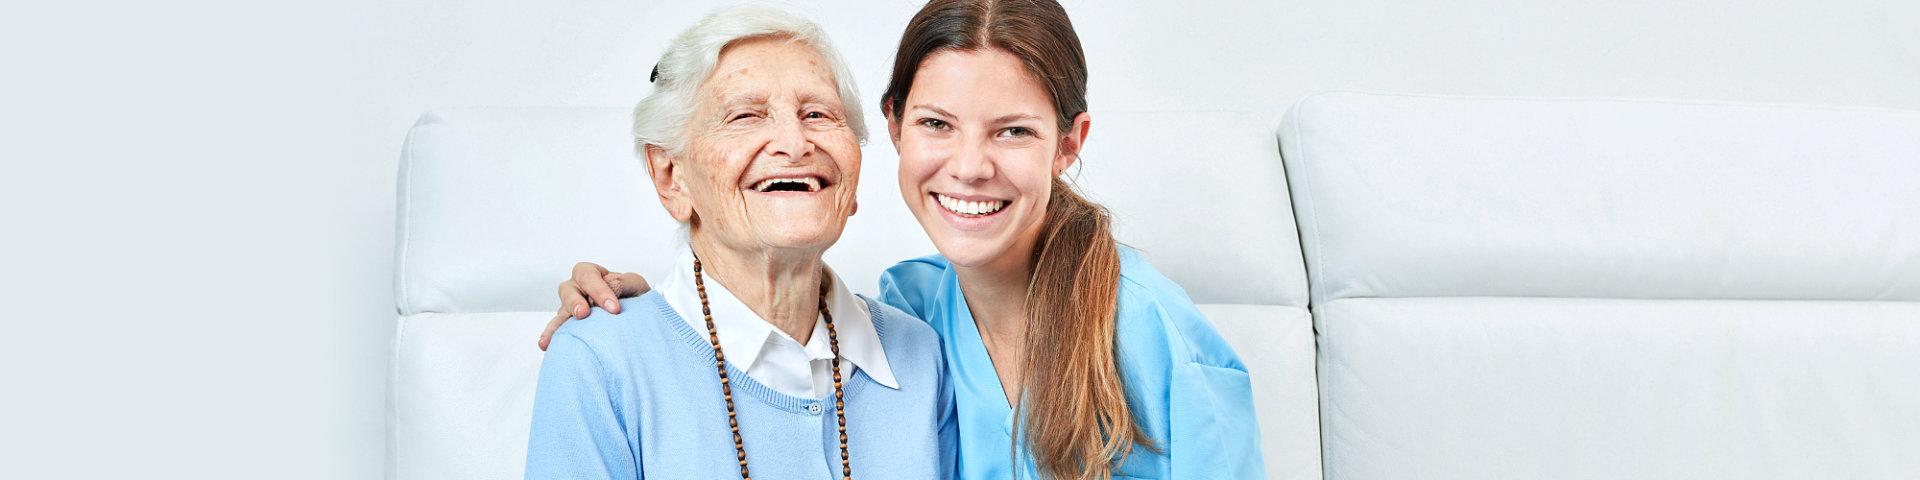 elder woman and her nurse